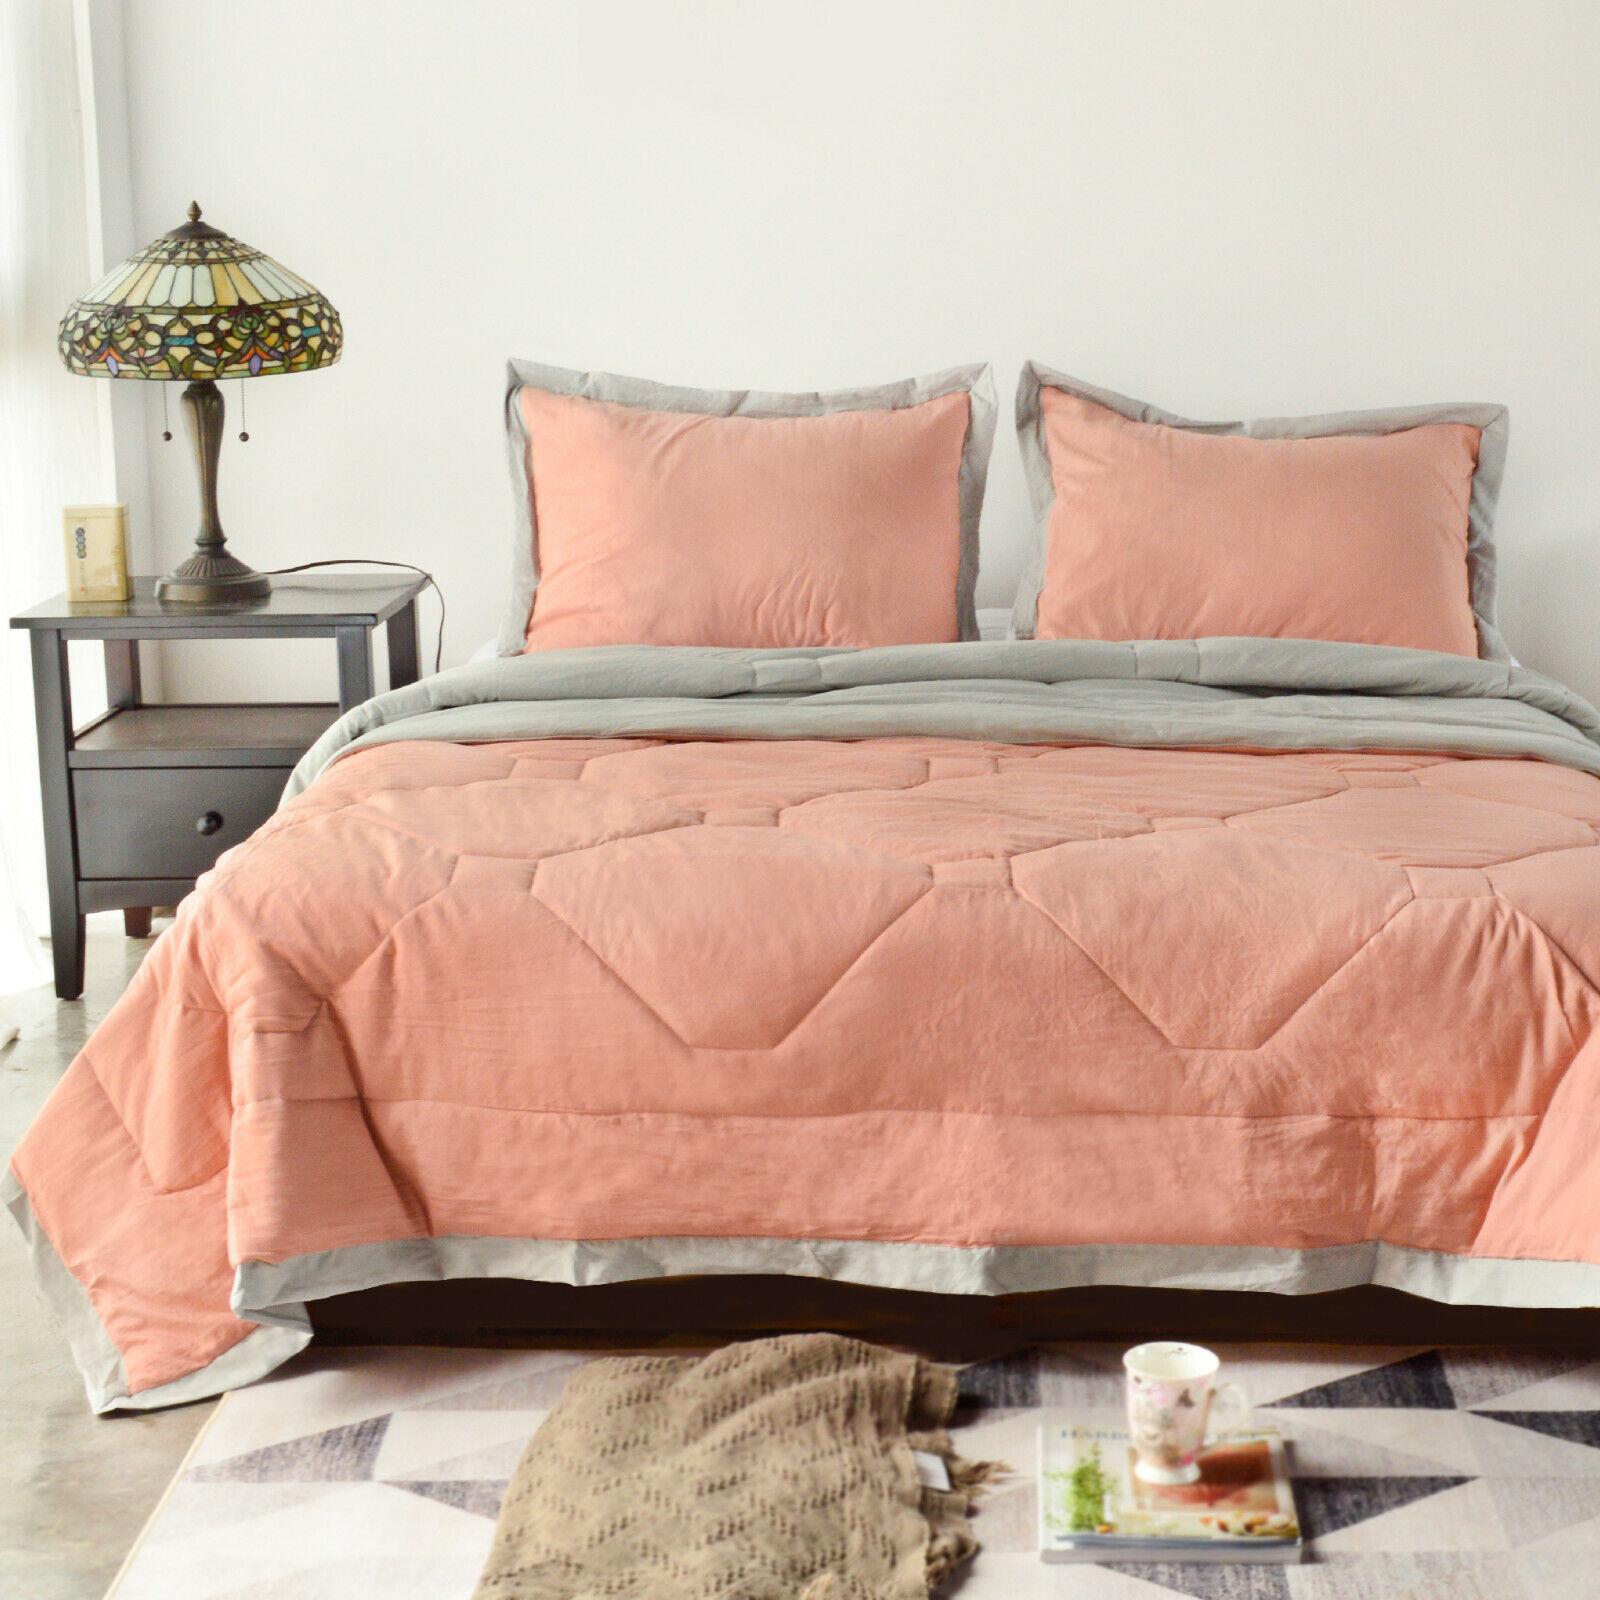 Luxury Soft Quilt Lightweight Comforter Quilted Microfiber B